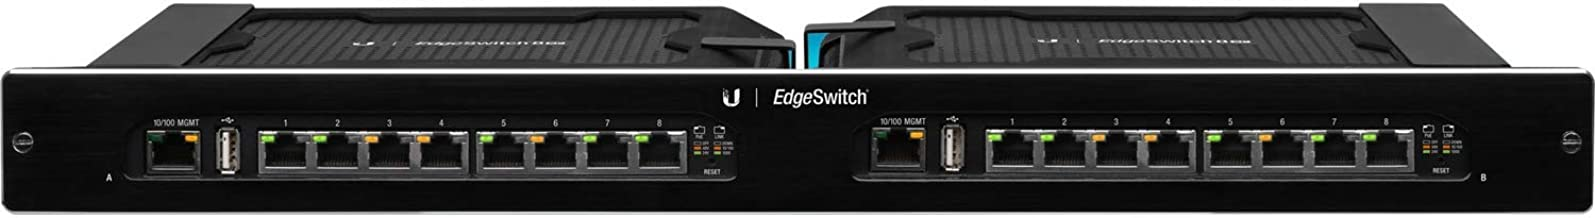 Ubiquiti Networks EdgeSwitch 16XP - Conmutador gestionado PoE de 16 puertos Gigabit (ES-16XP)